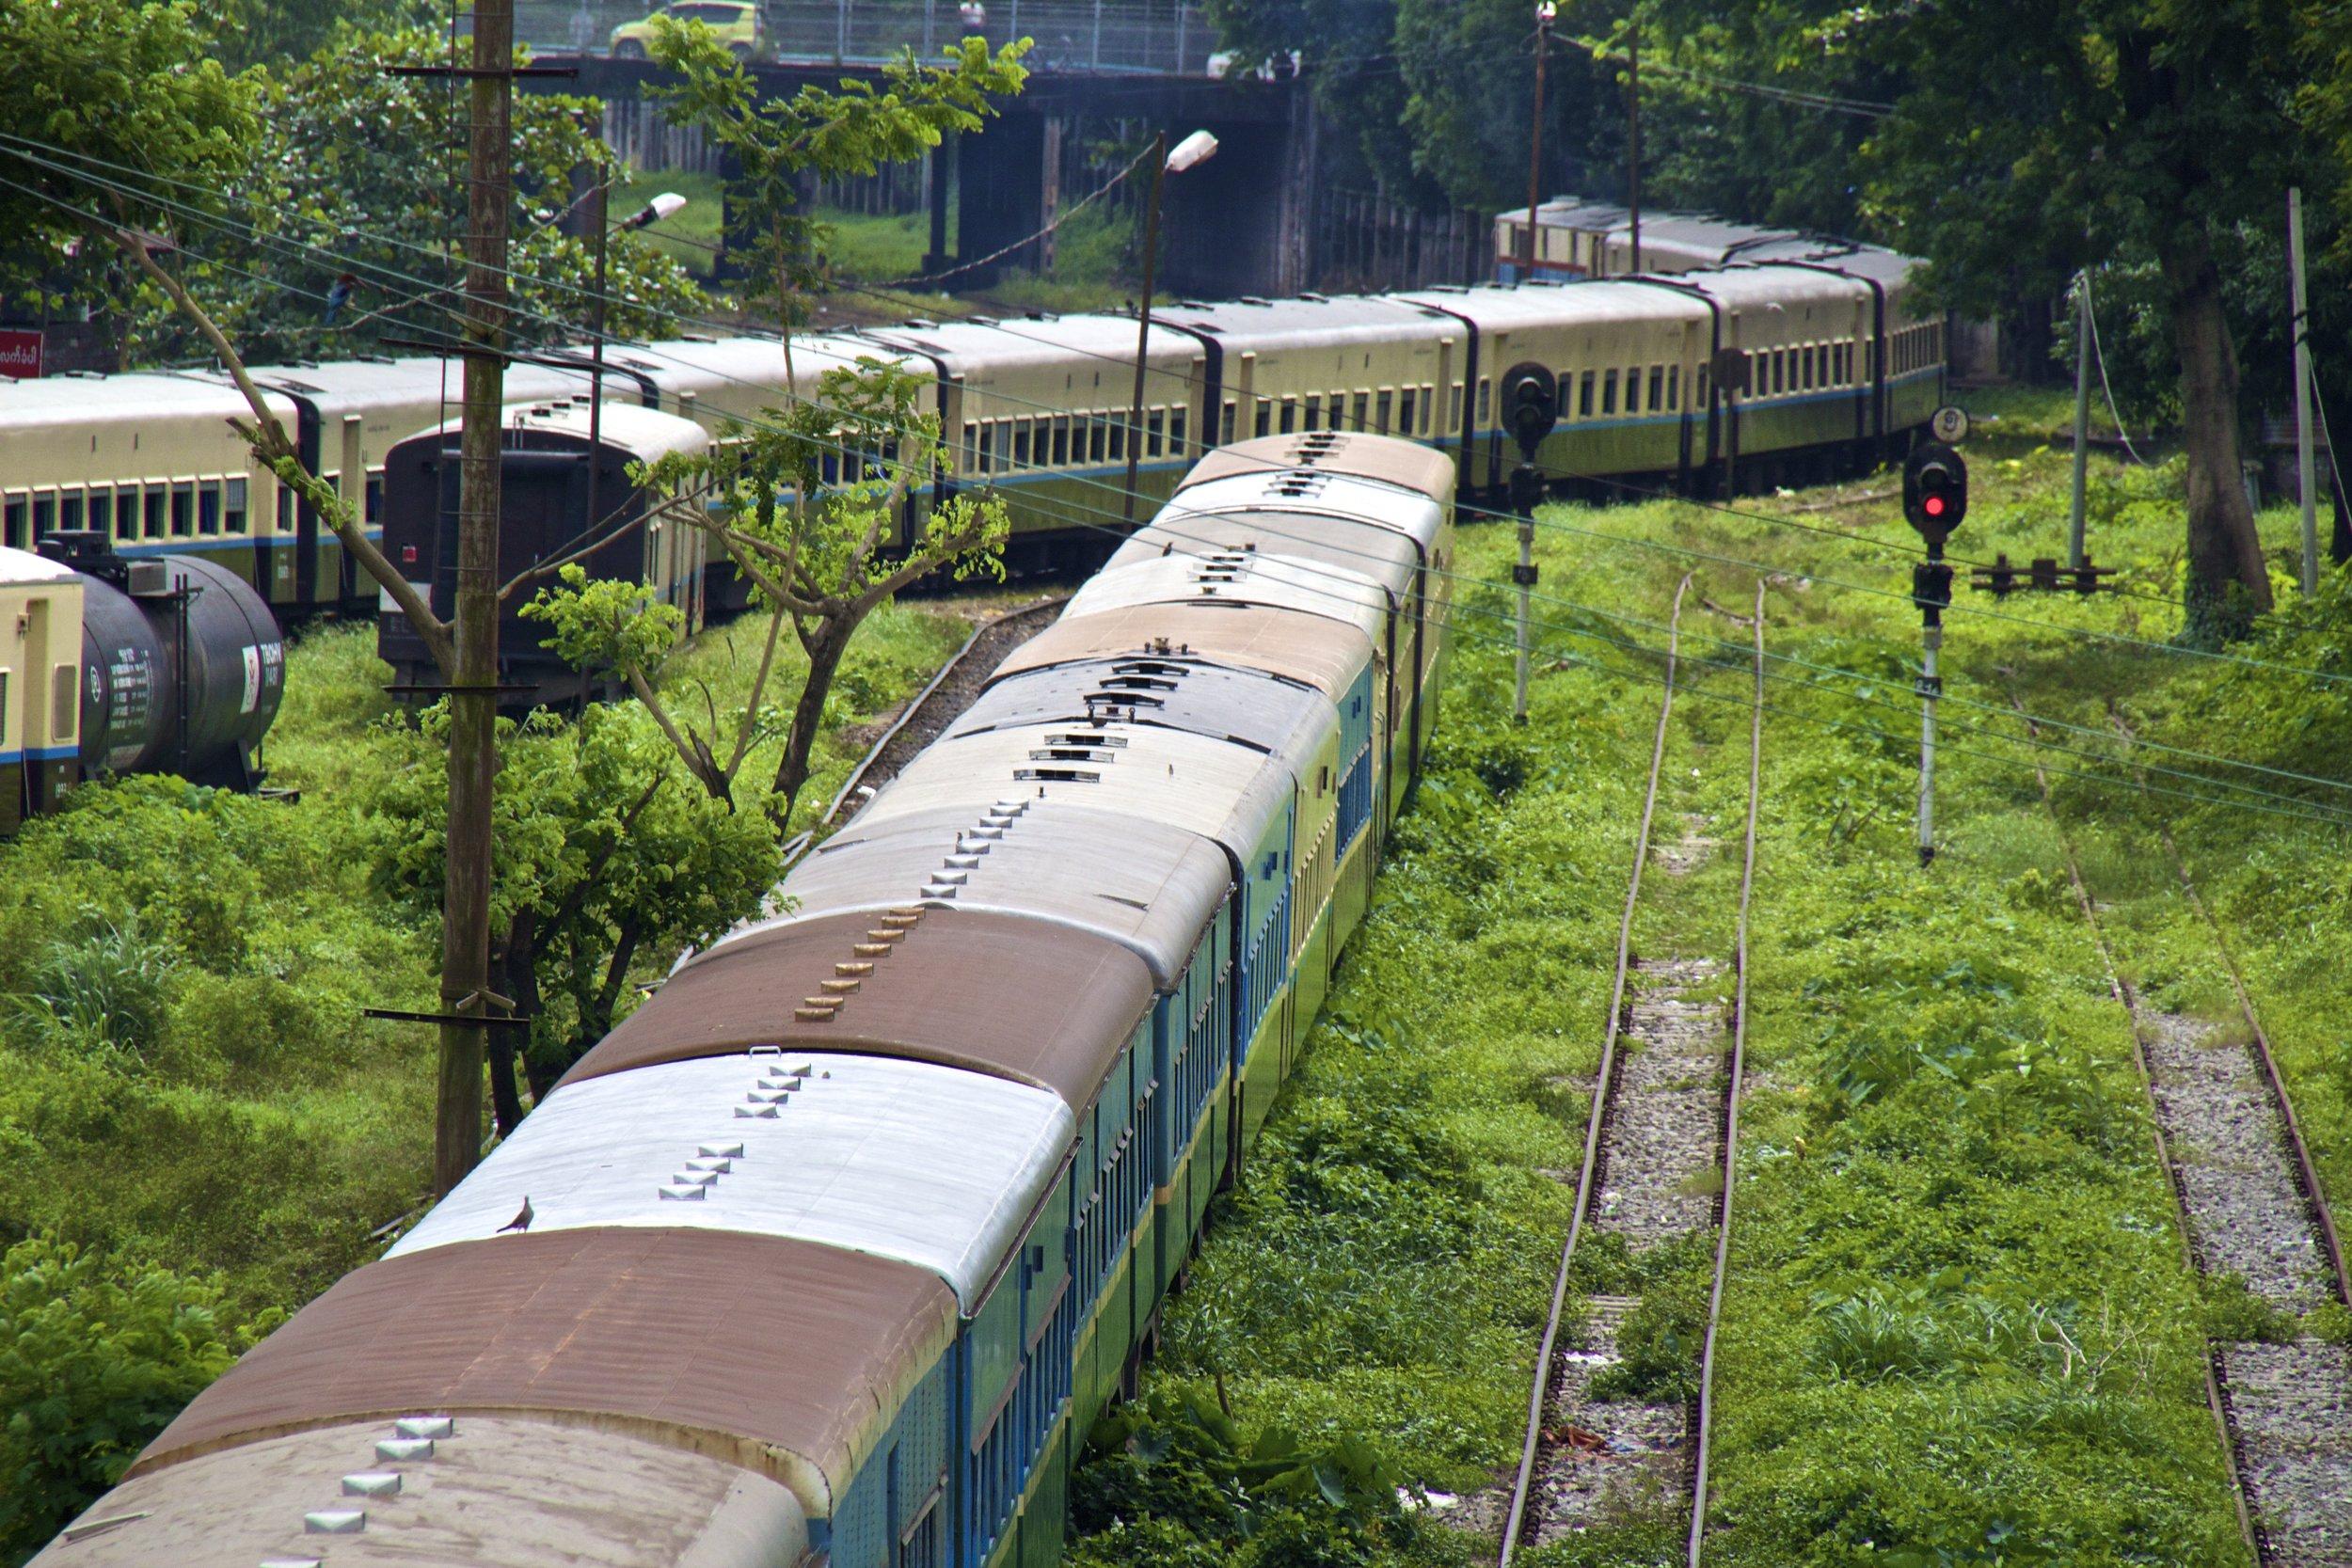 rangoon burma yangon myanmar 27.jpg